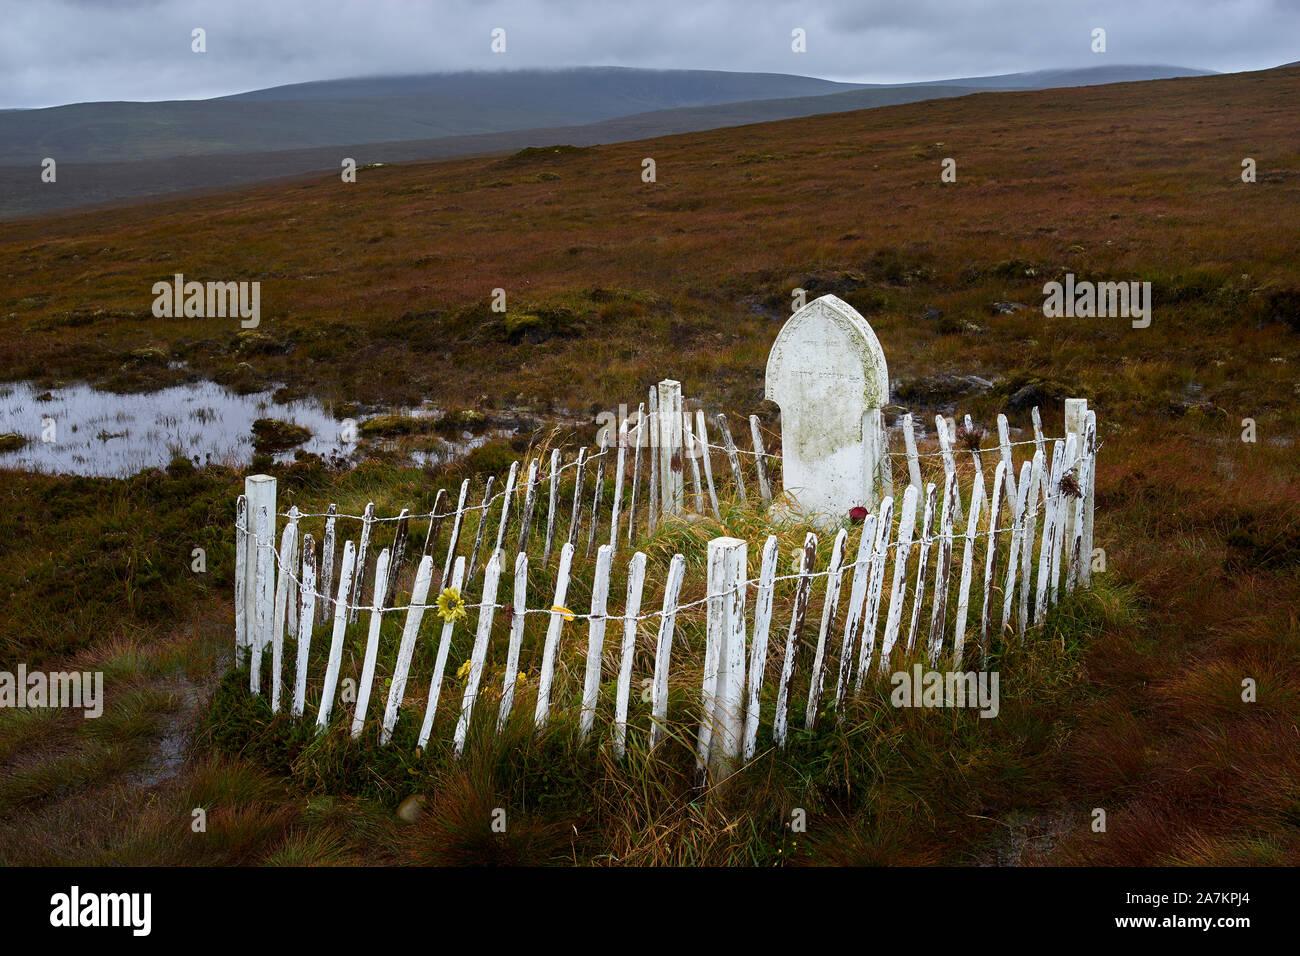 Betty Corrigall's grave, Hoy, Orkney, Scotland Stock Photo